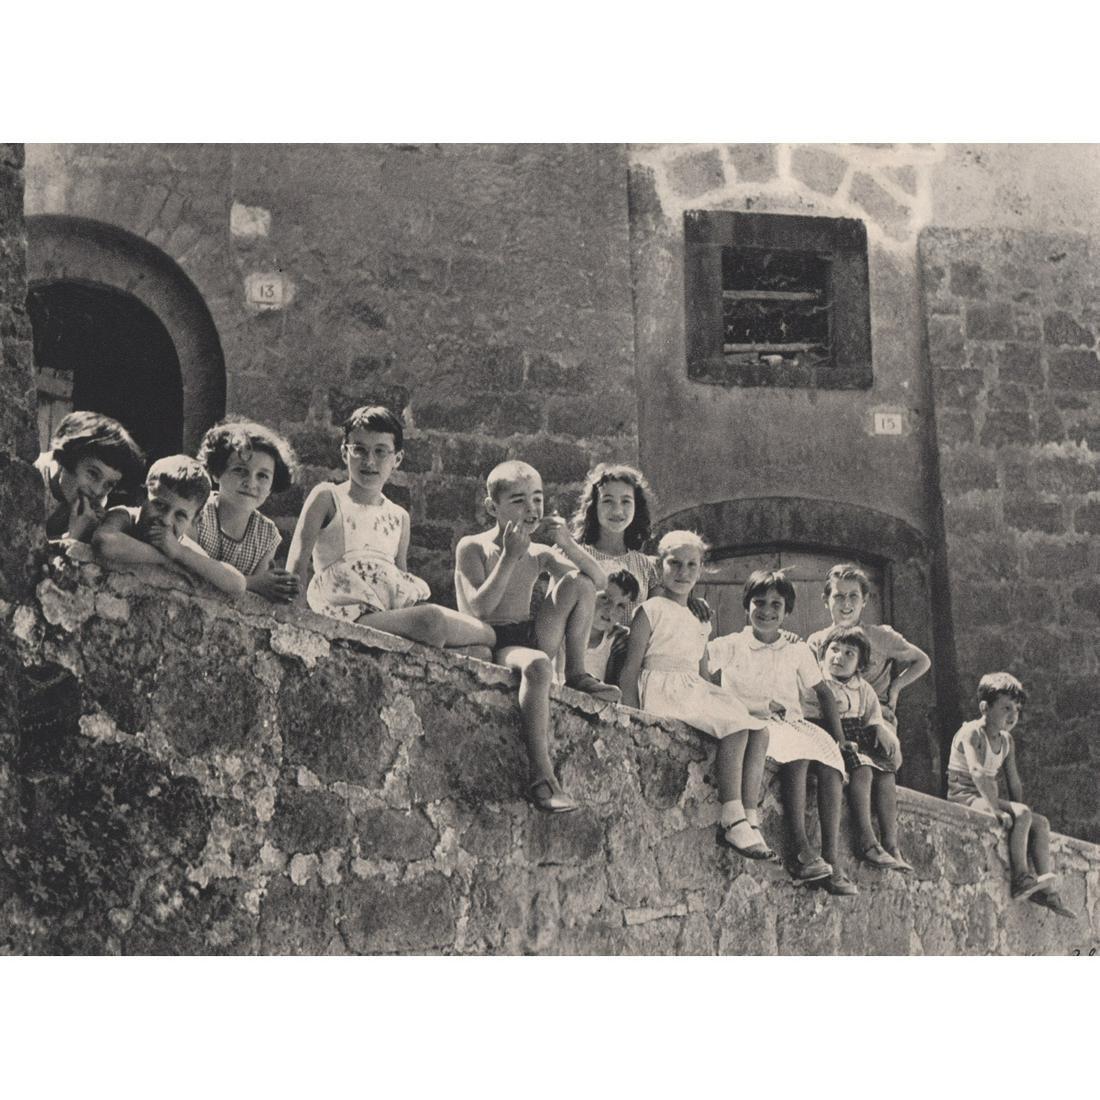 VINCENZO BALOCCHI - Children in Orvieto